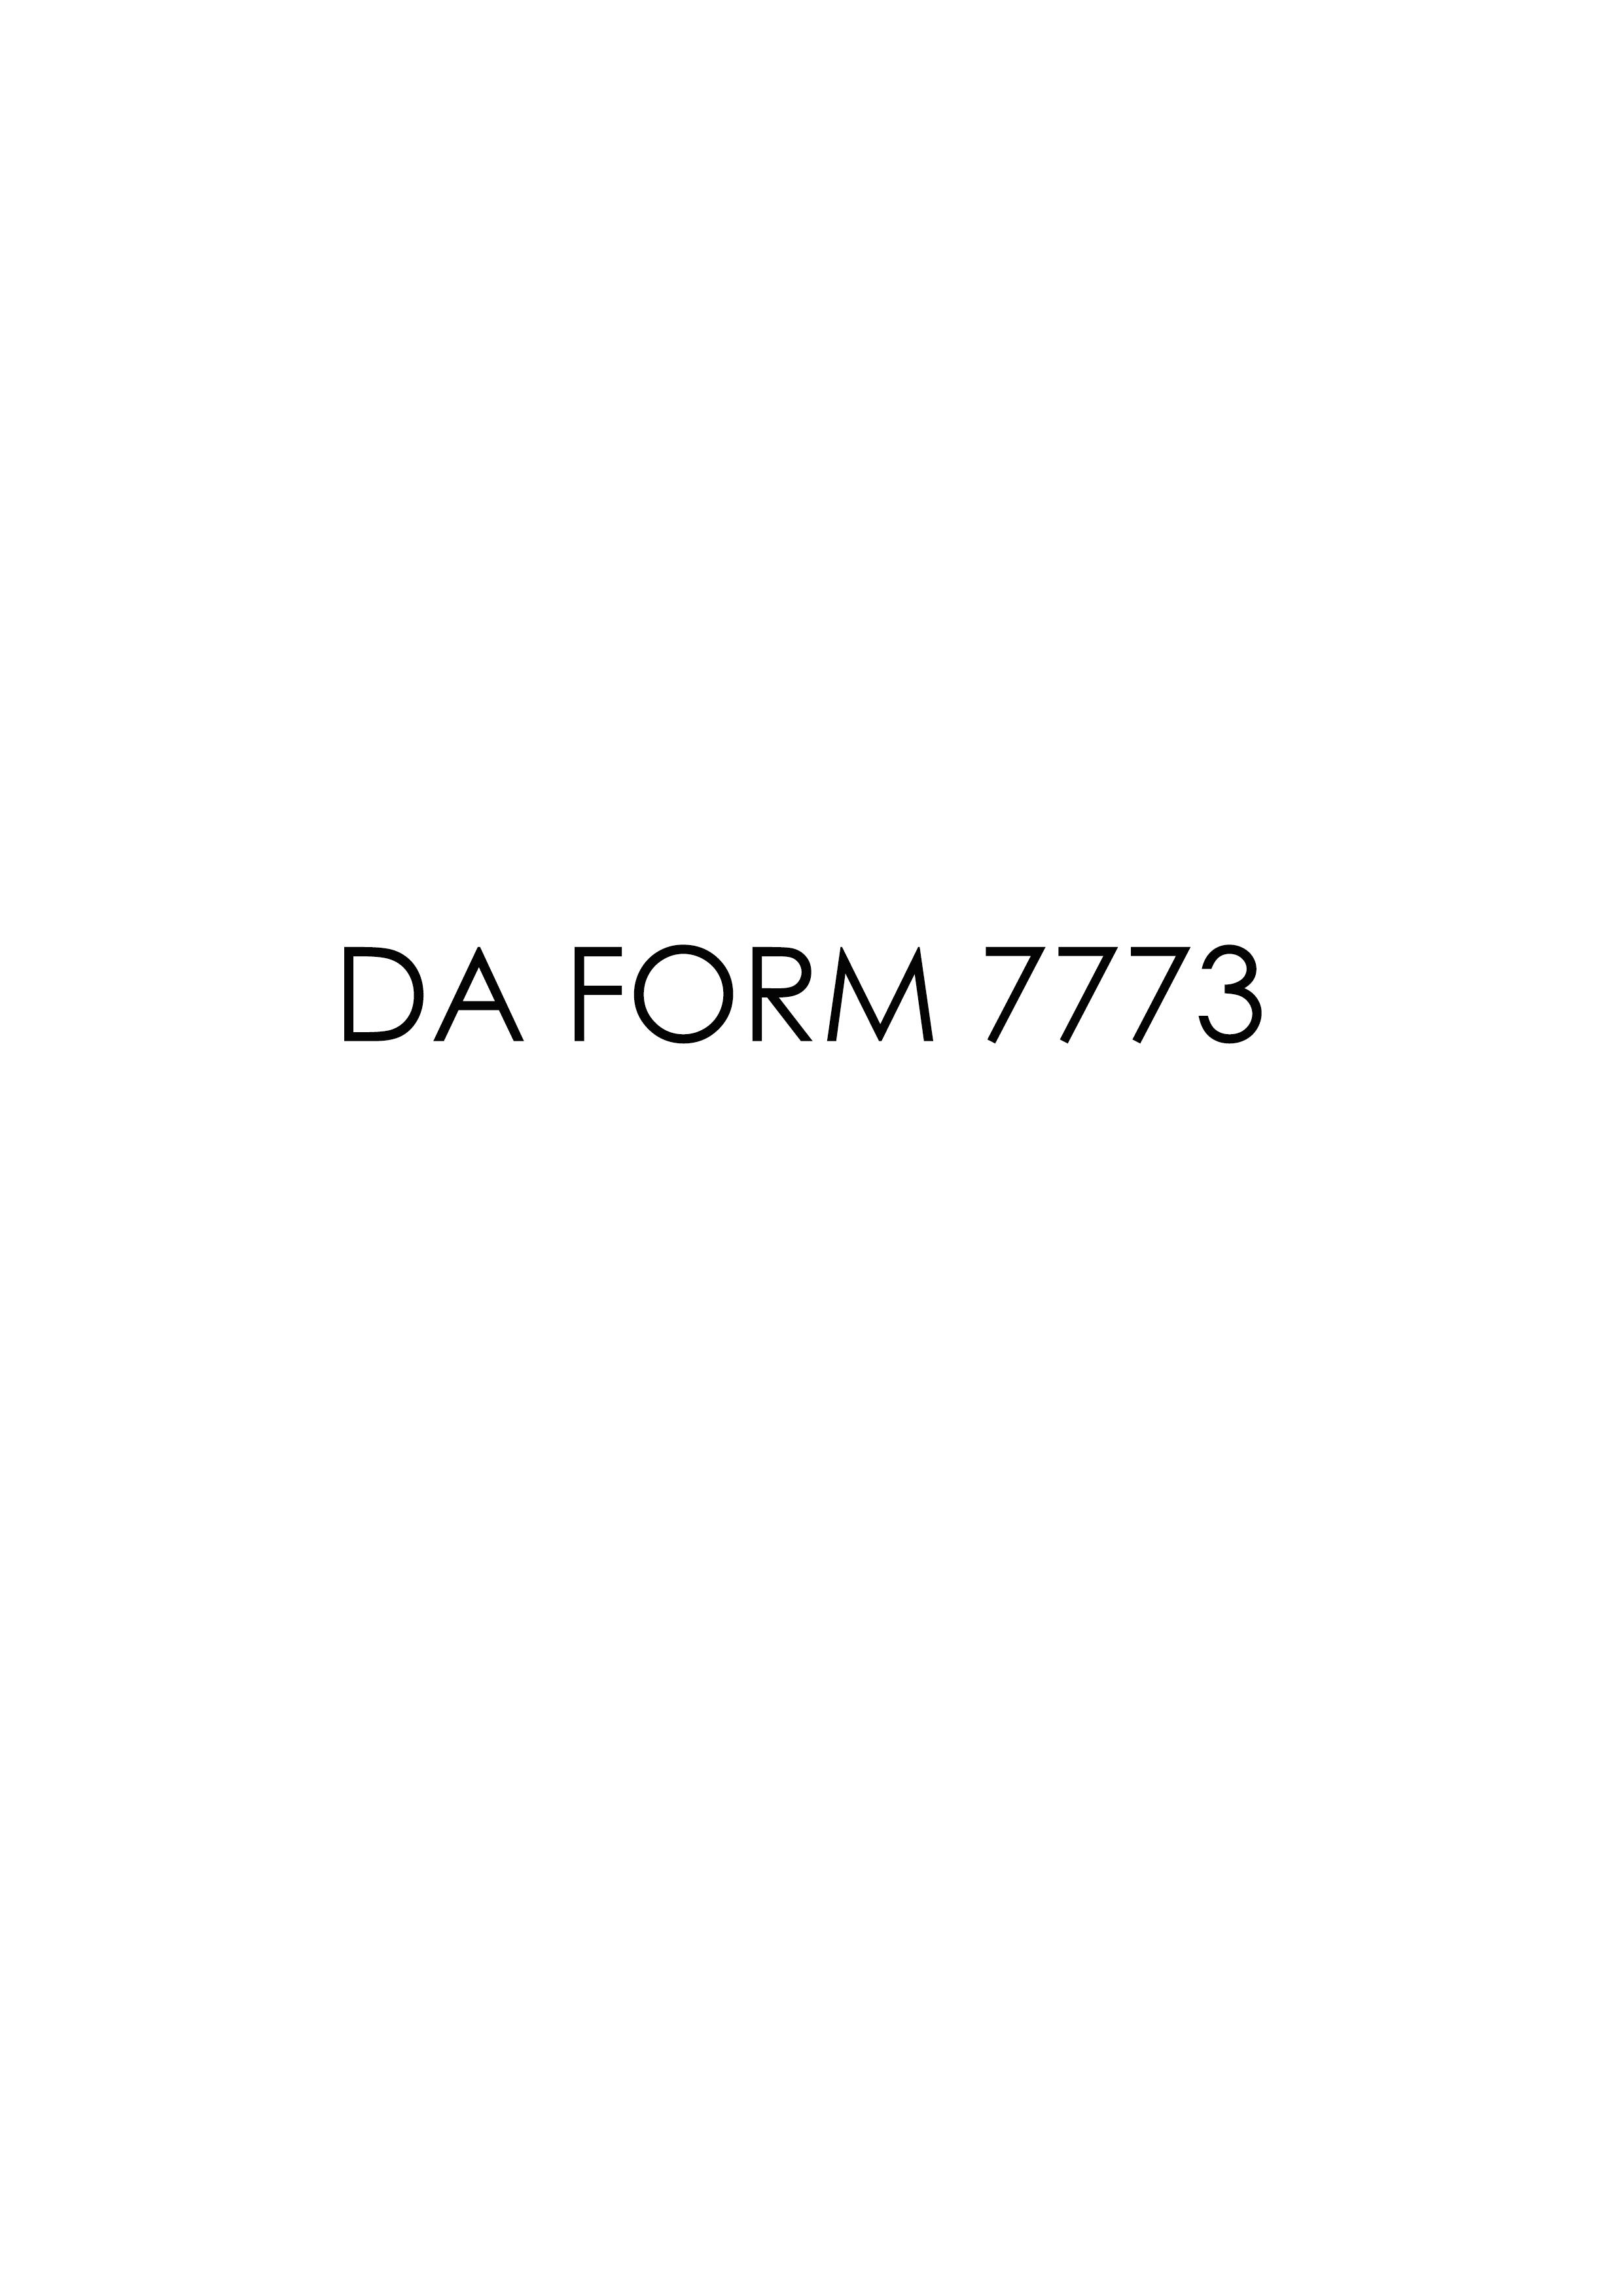 Download da Form 7773 Free